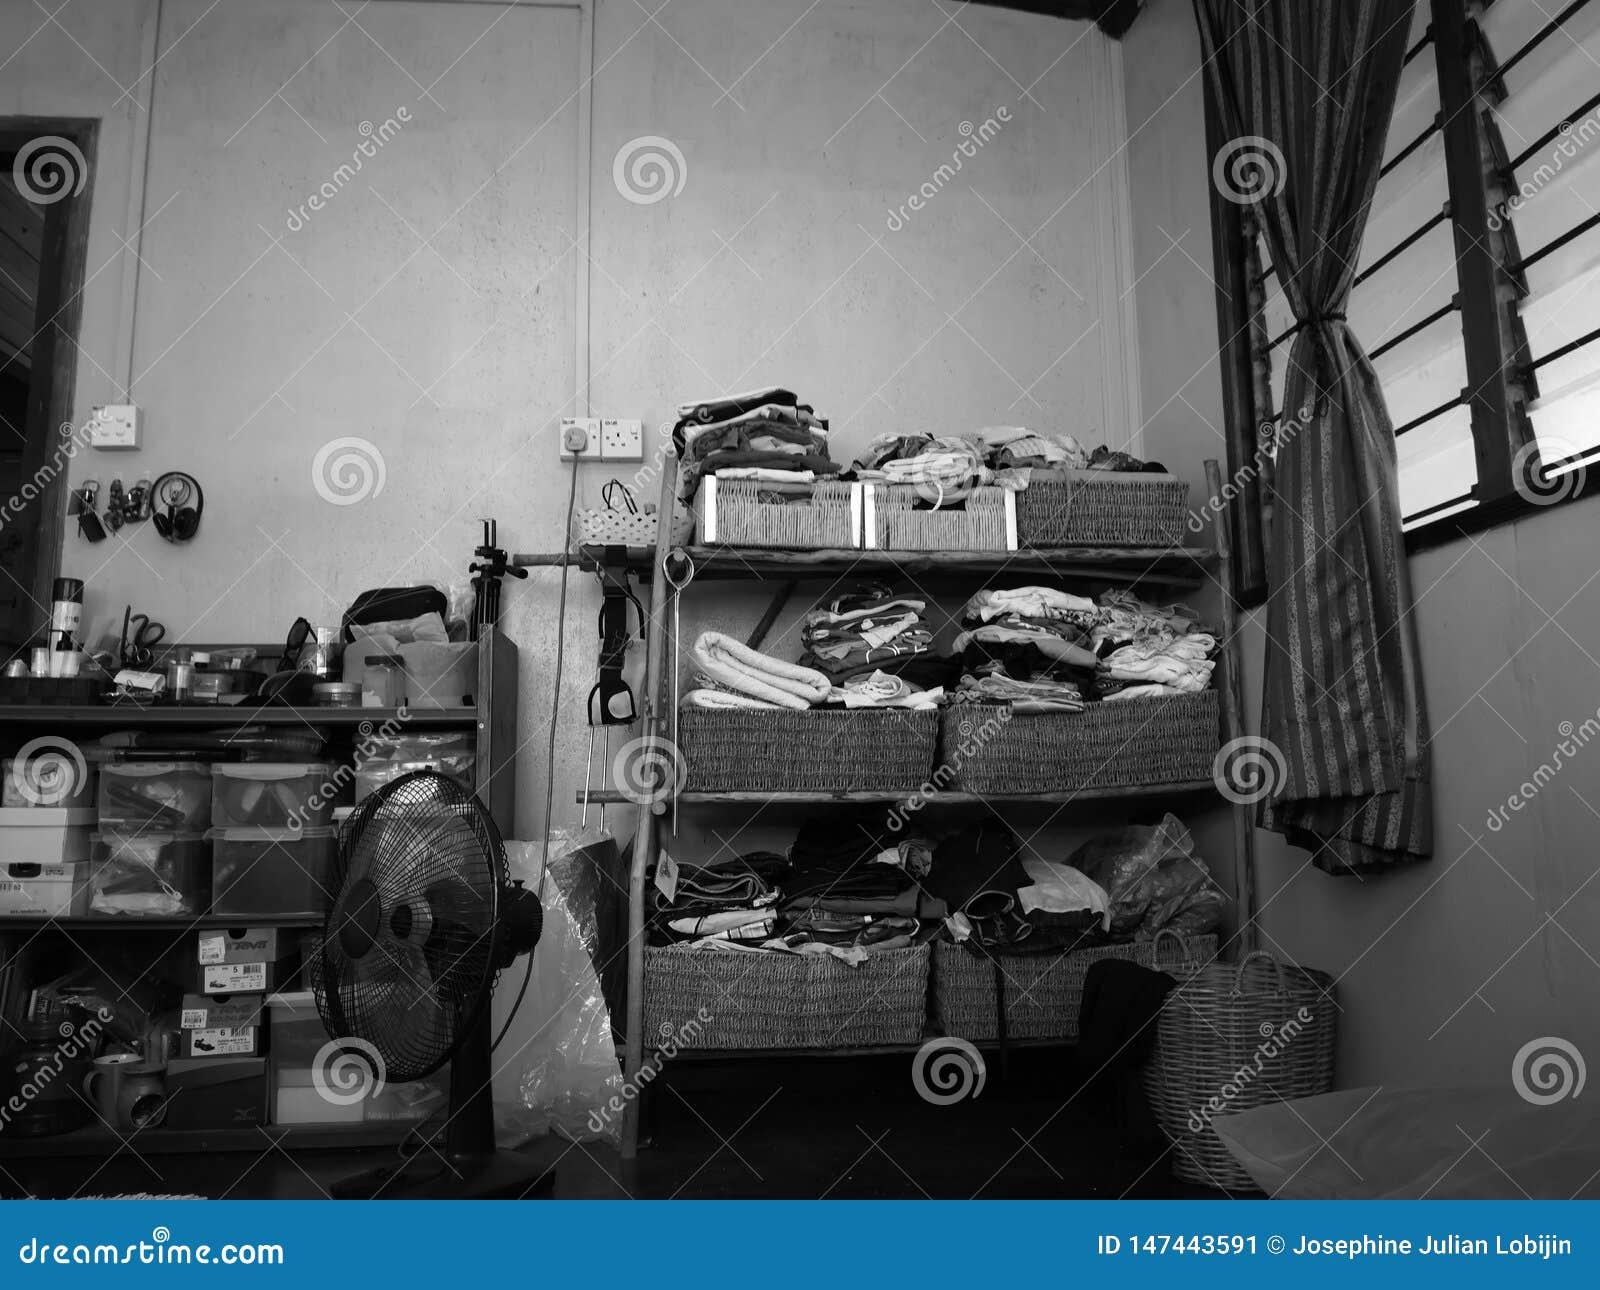 A black and white photo of a tiny homemade small closet.